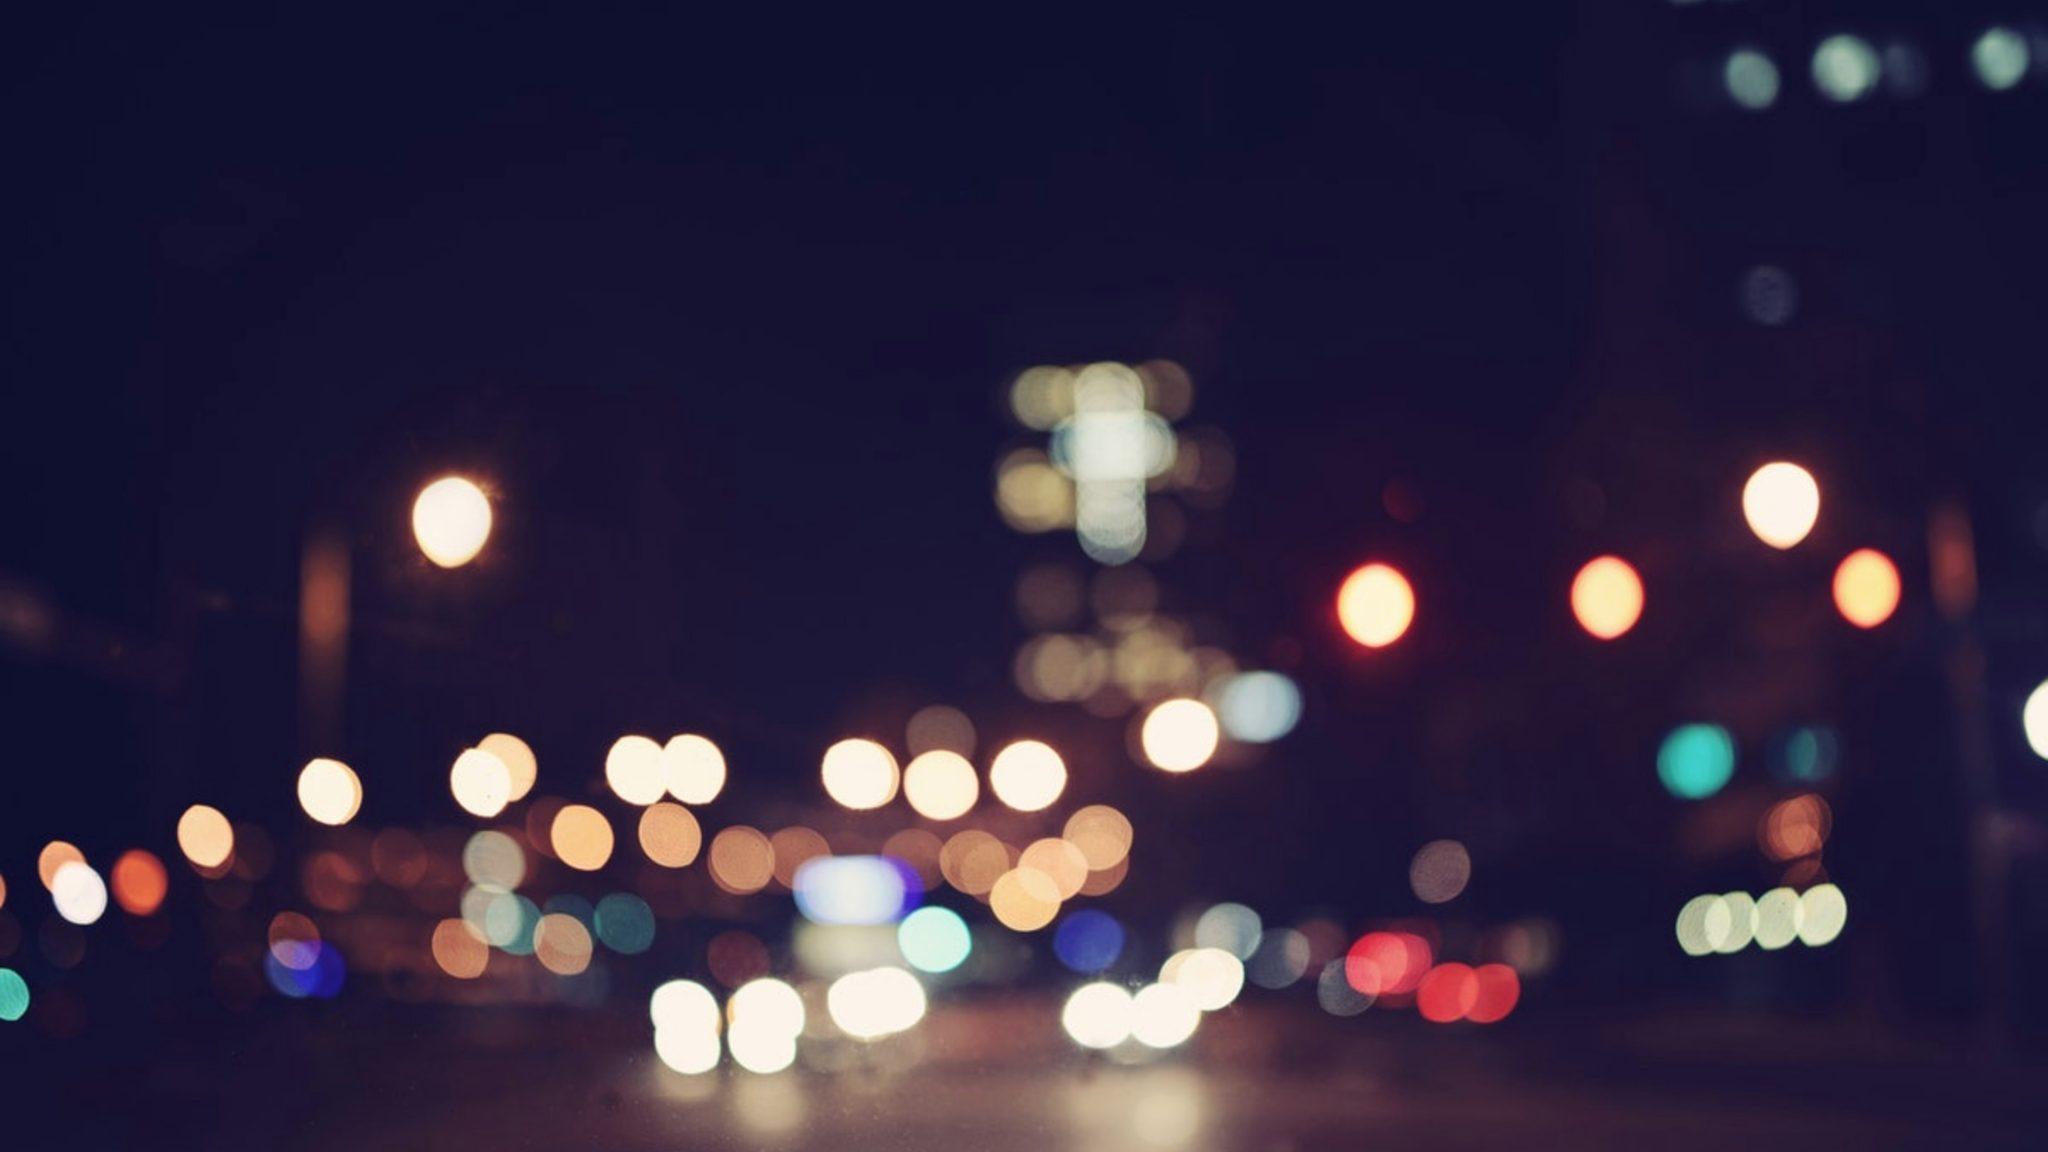 Cityblurr